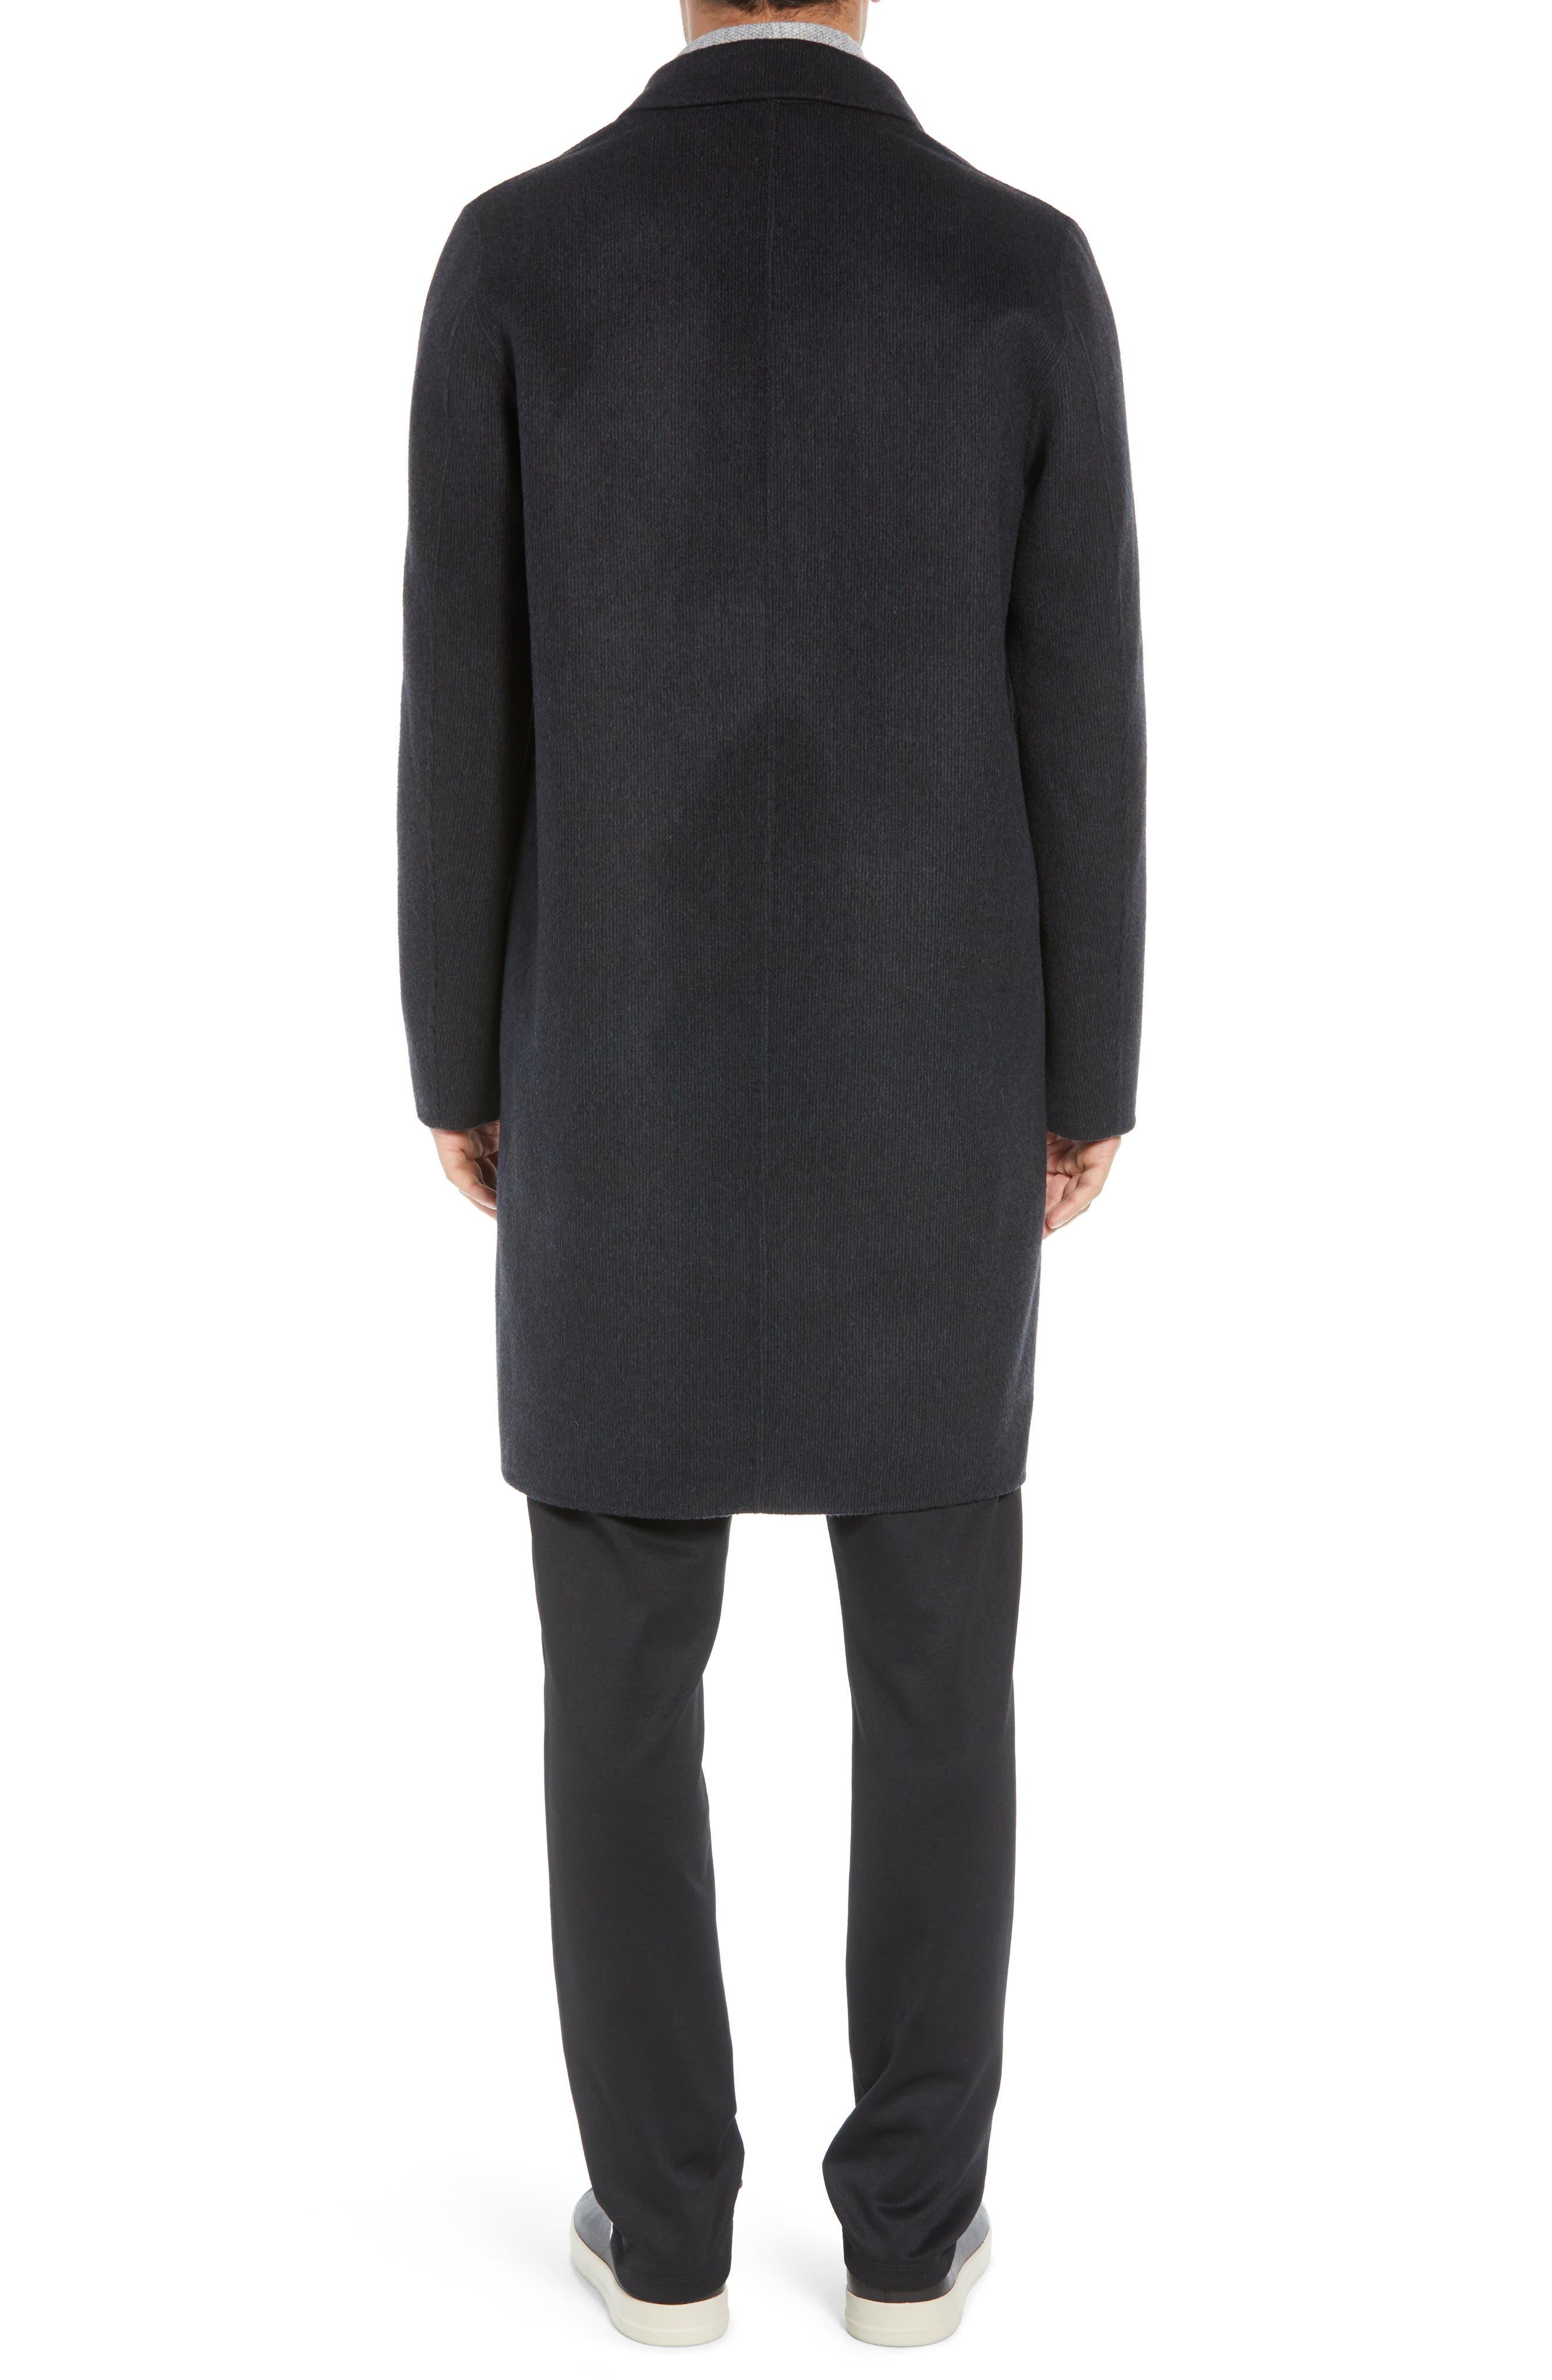 Wool Blend Car Coat,                             Alternate thumbnail 2, color,                             BLACK/ H CHARCOAL